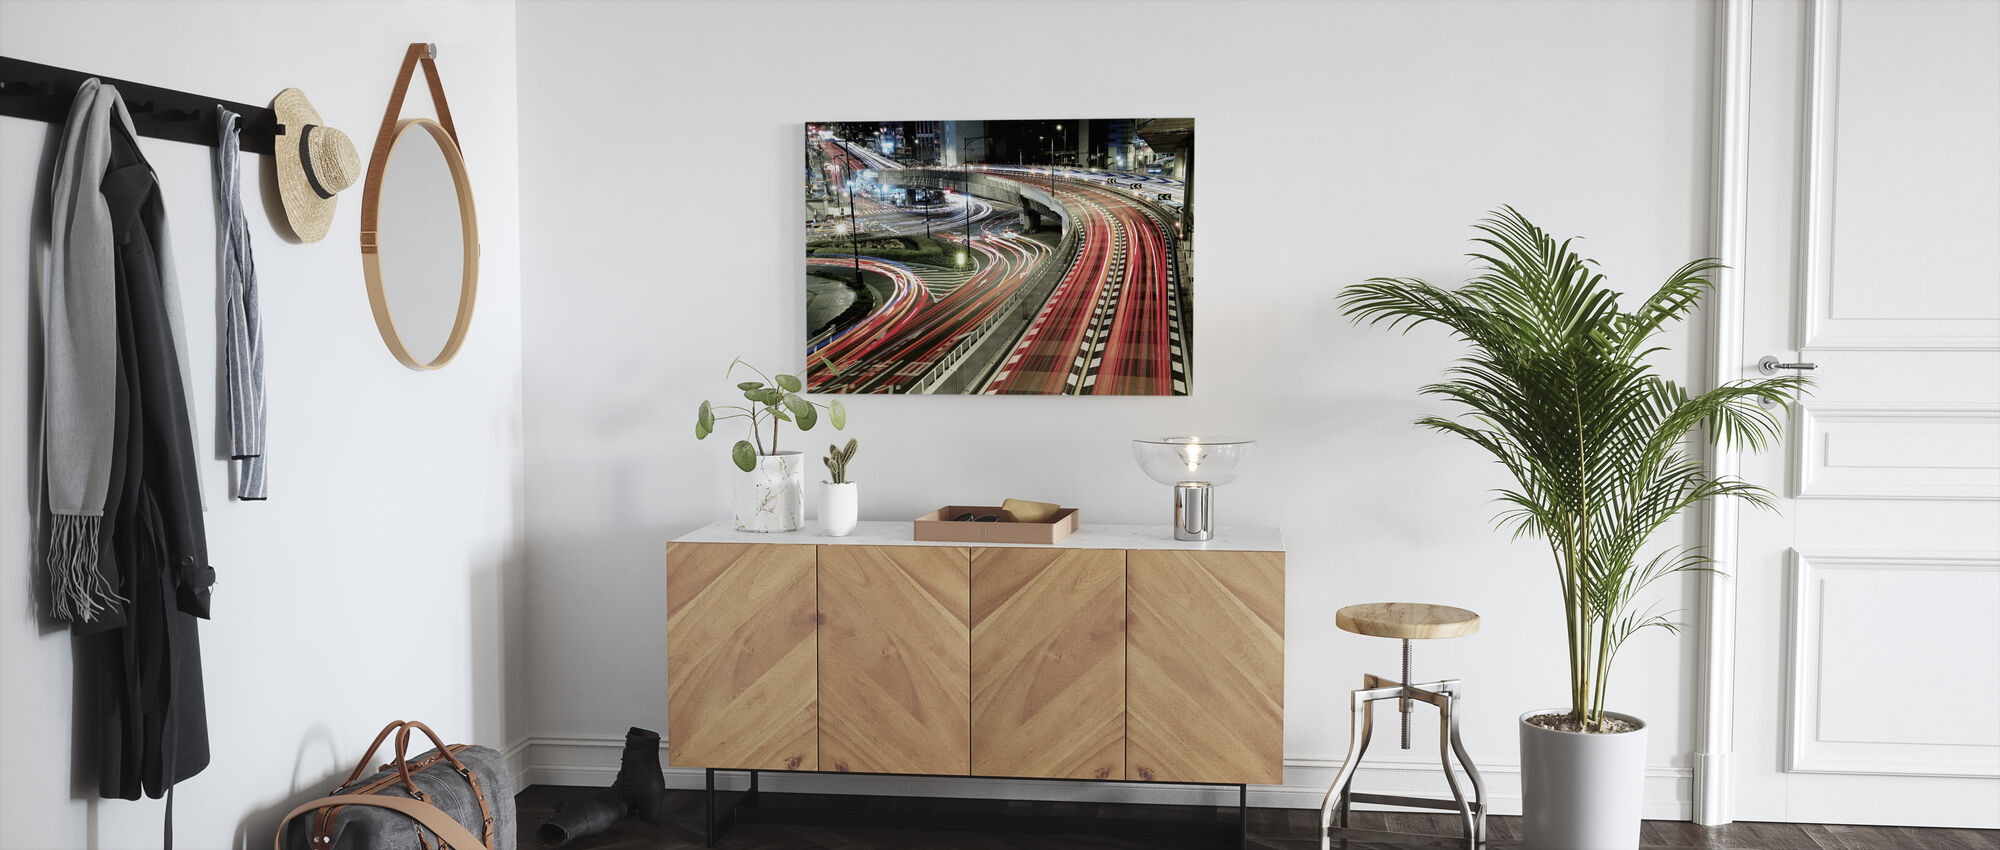 Chaotic traffic - Canvas print - Hallway